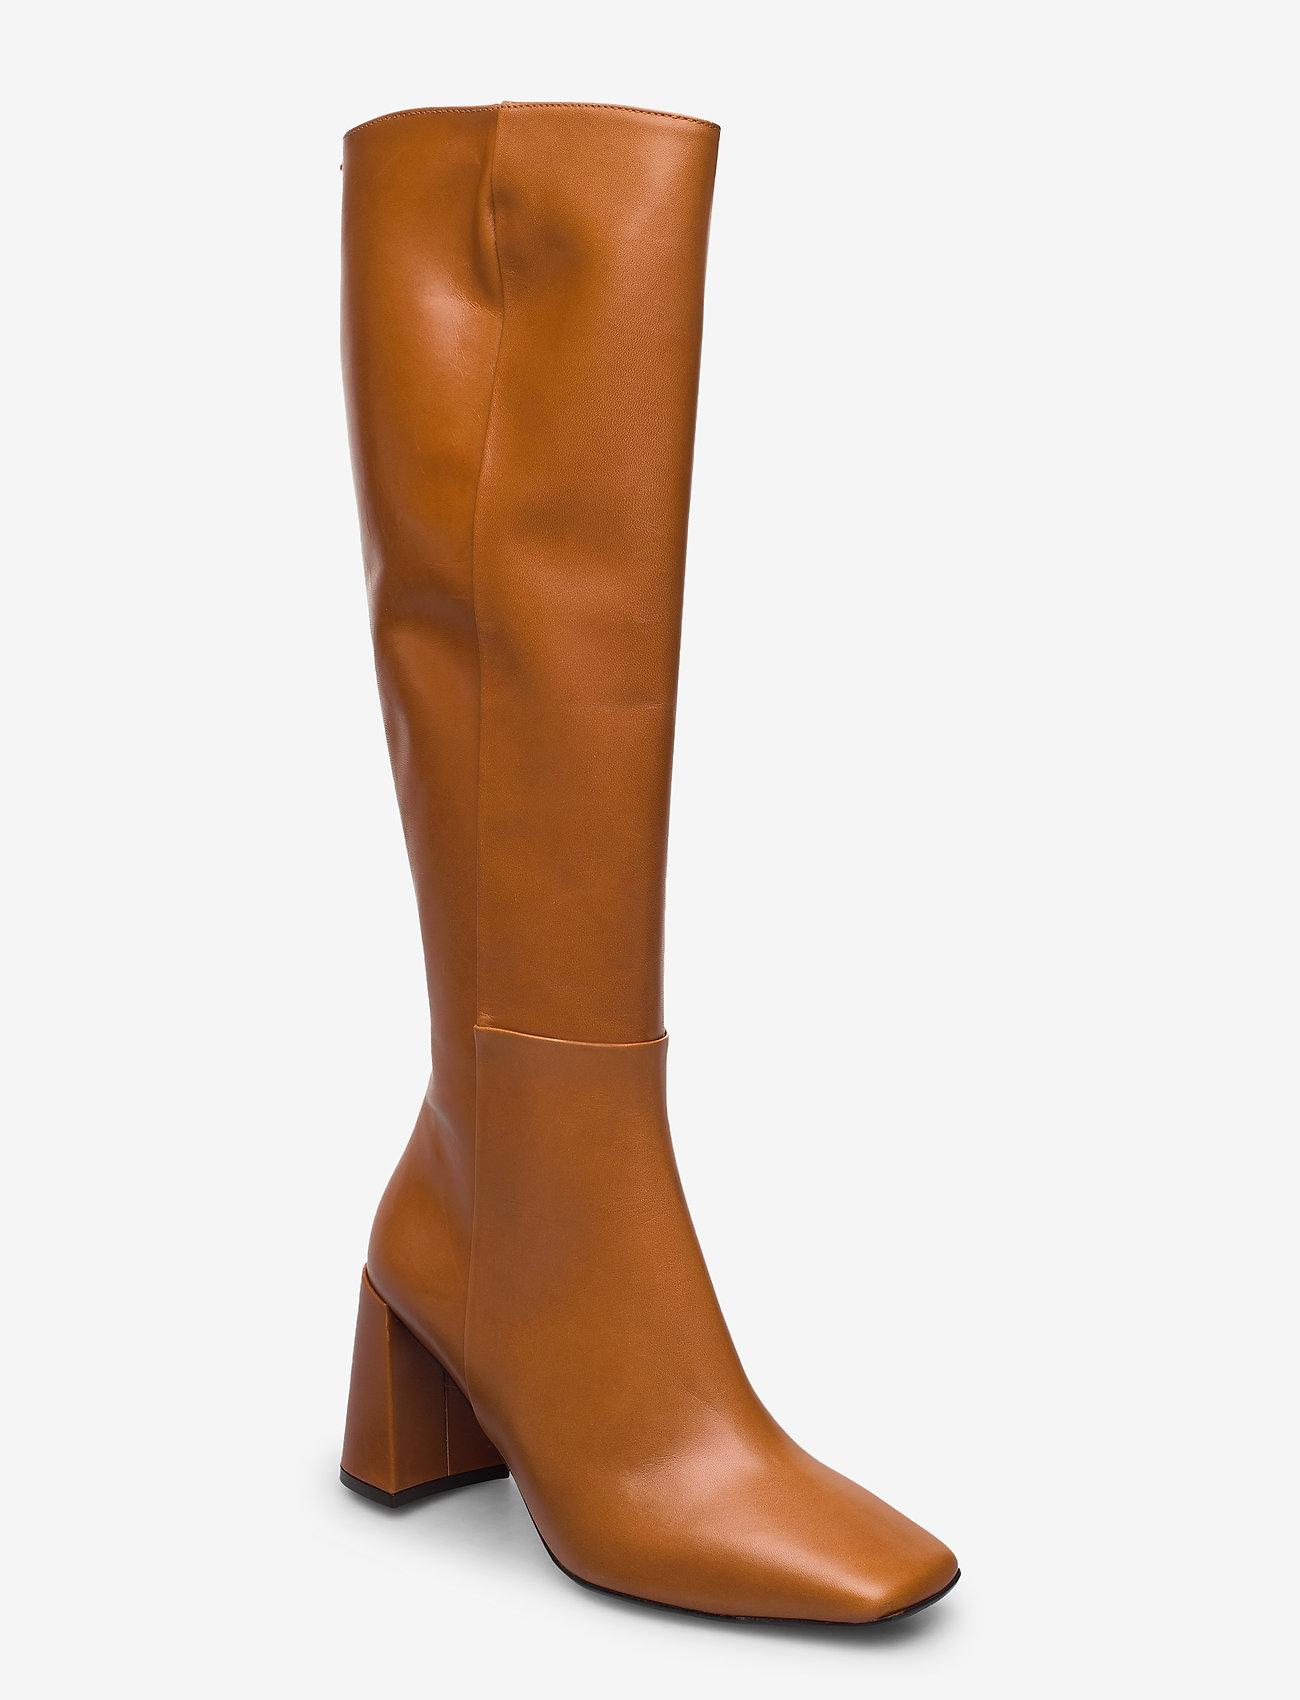 Billi Bi - Long Boots 5123 - lange laarzen - cognac 456 calf 85 - 0